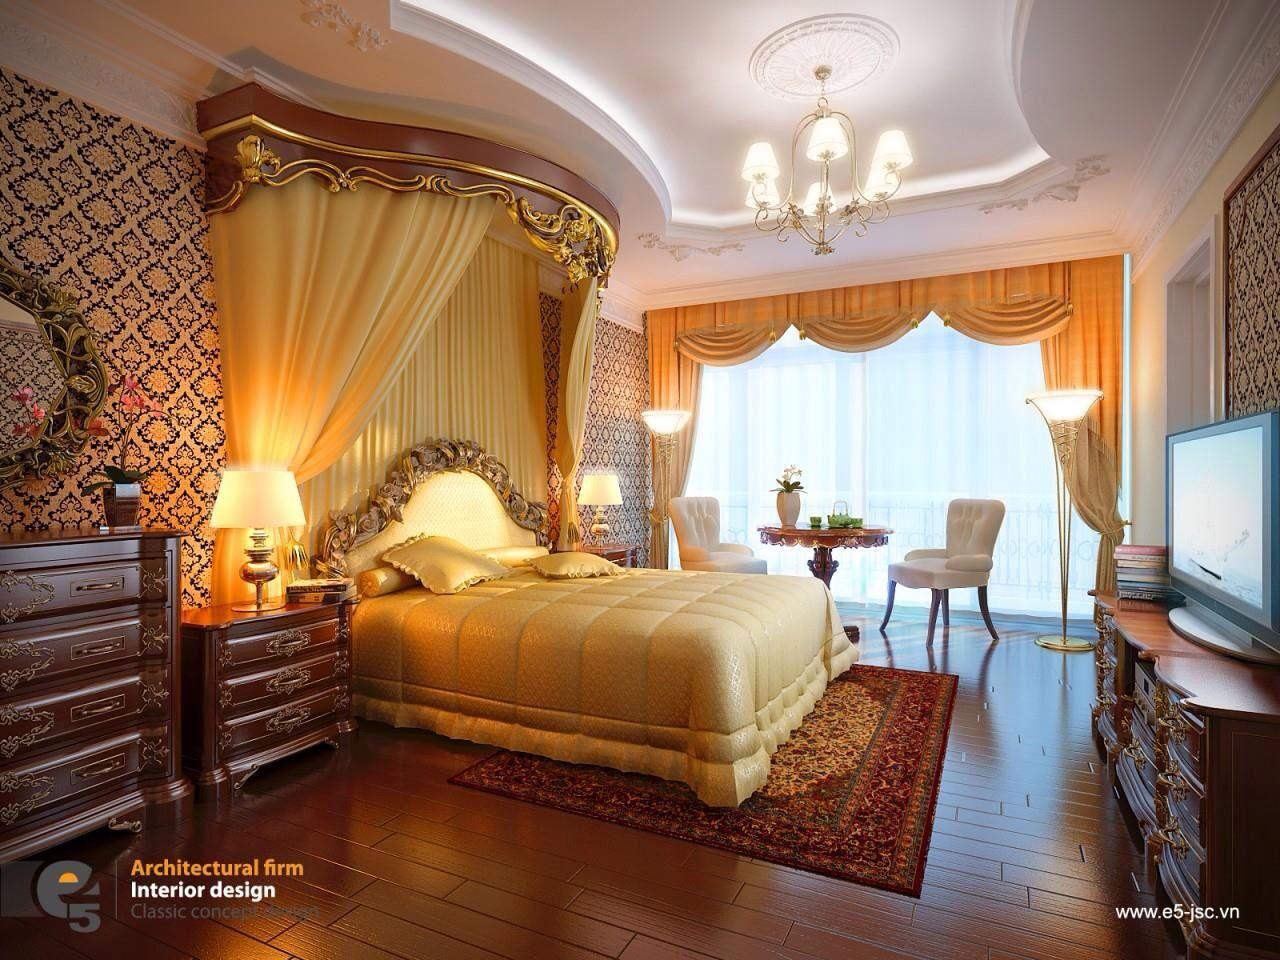 New bedroom interior design pin by stella mukami on bedrooms  pinterest  bedrooms